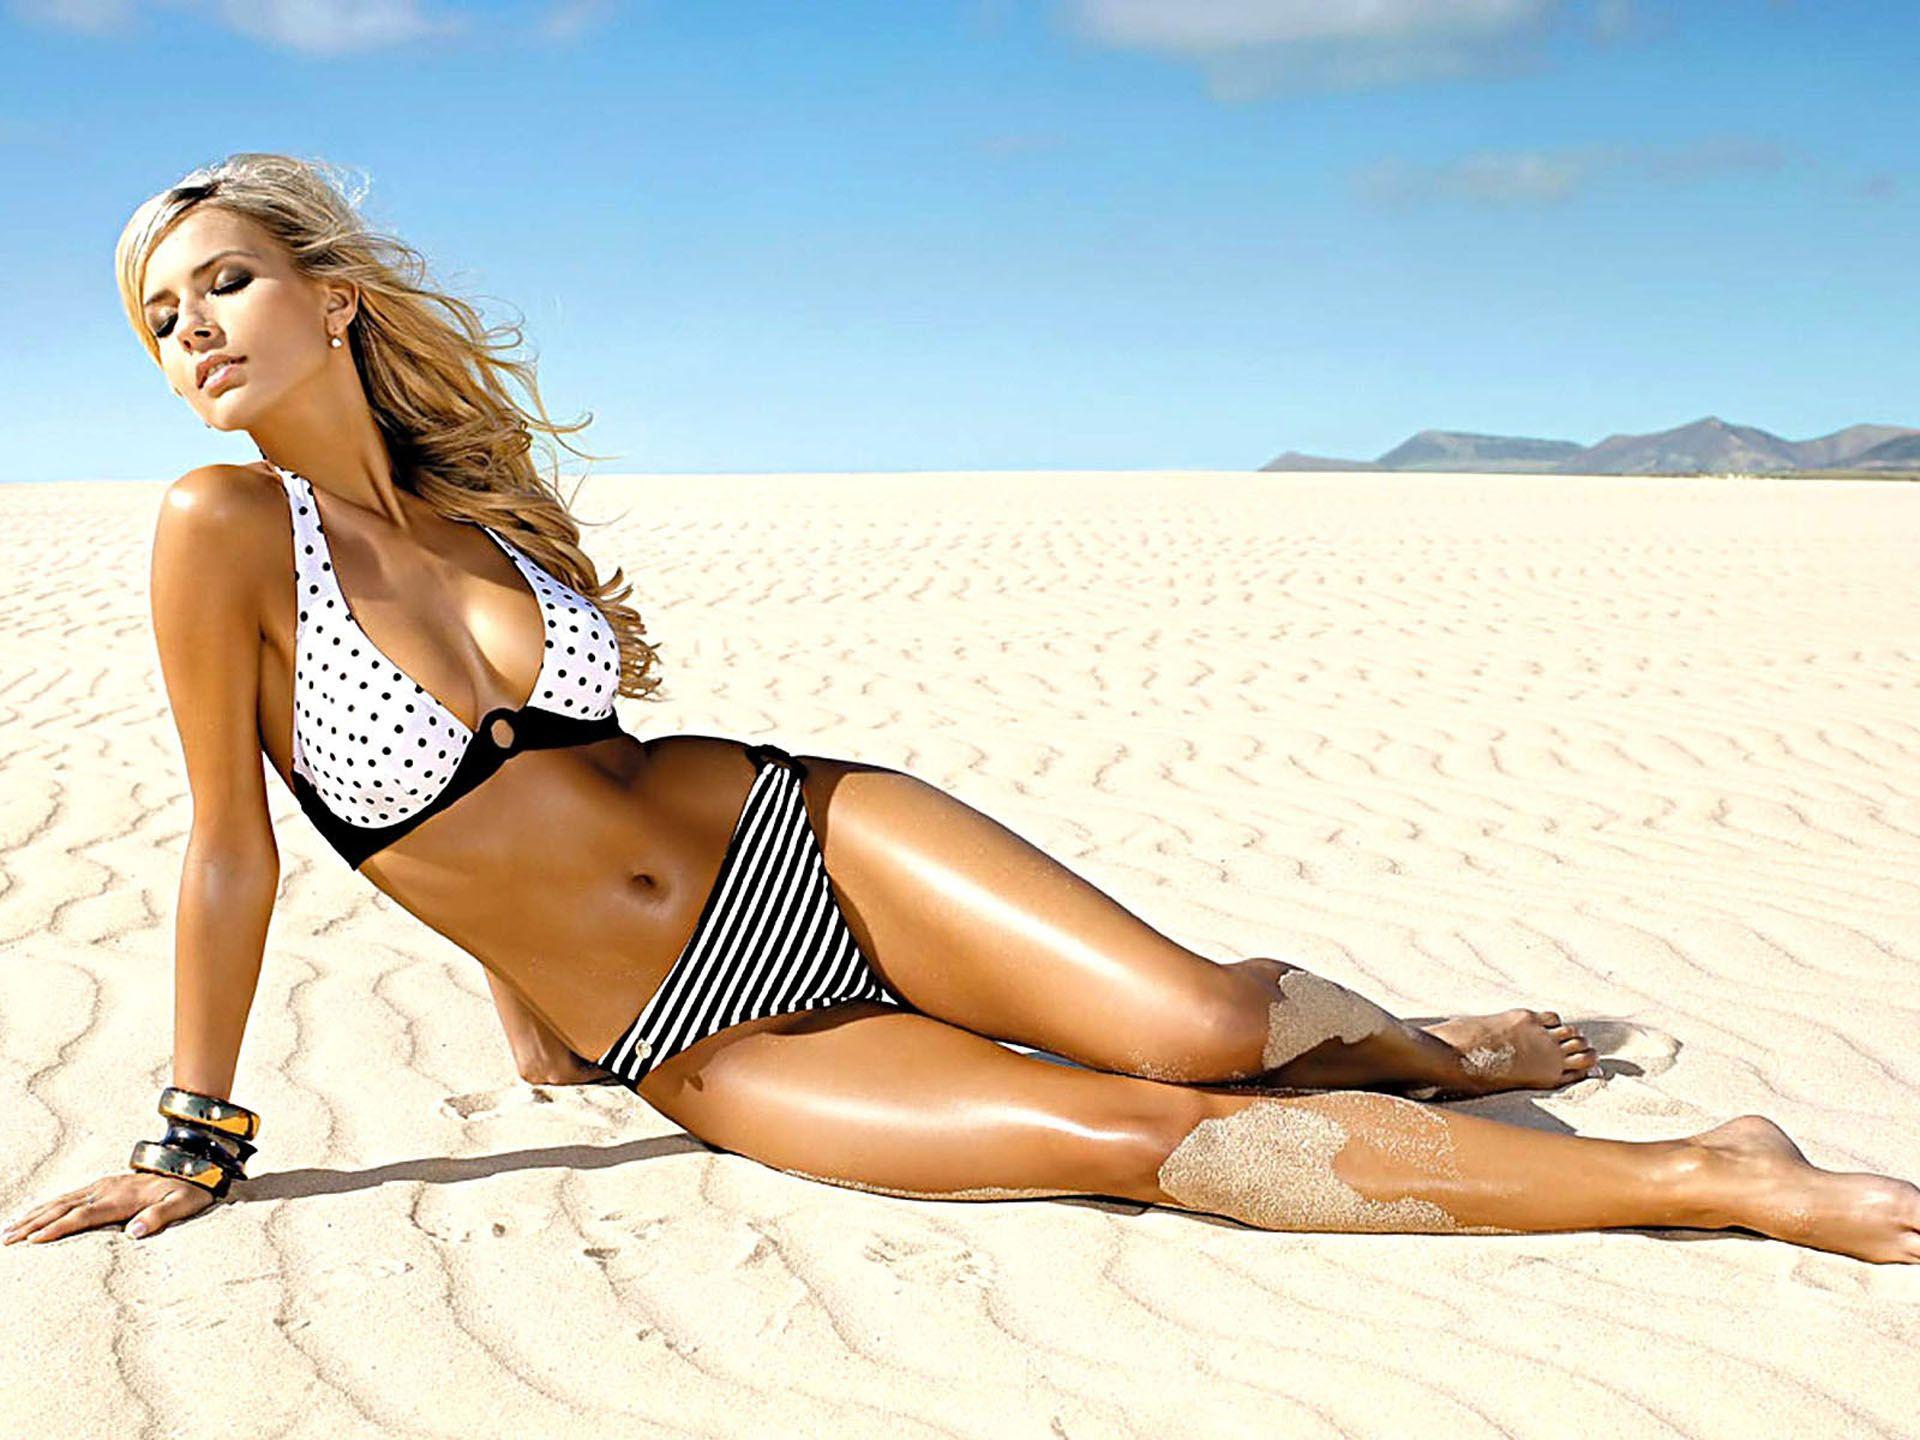 beach wear beach dresses, beachwear, beachwear clothing, beachwear clothing men,  beachwear dresses, beachwear OHQKOSK